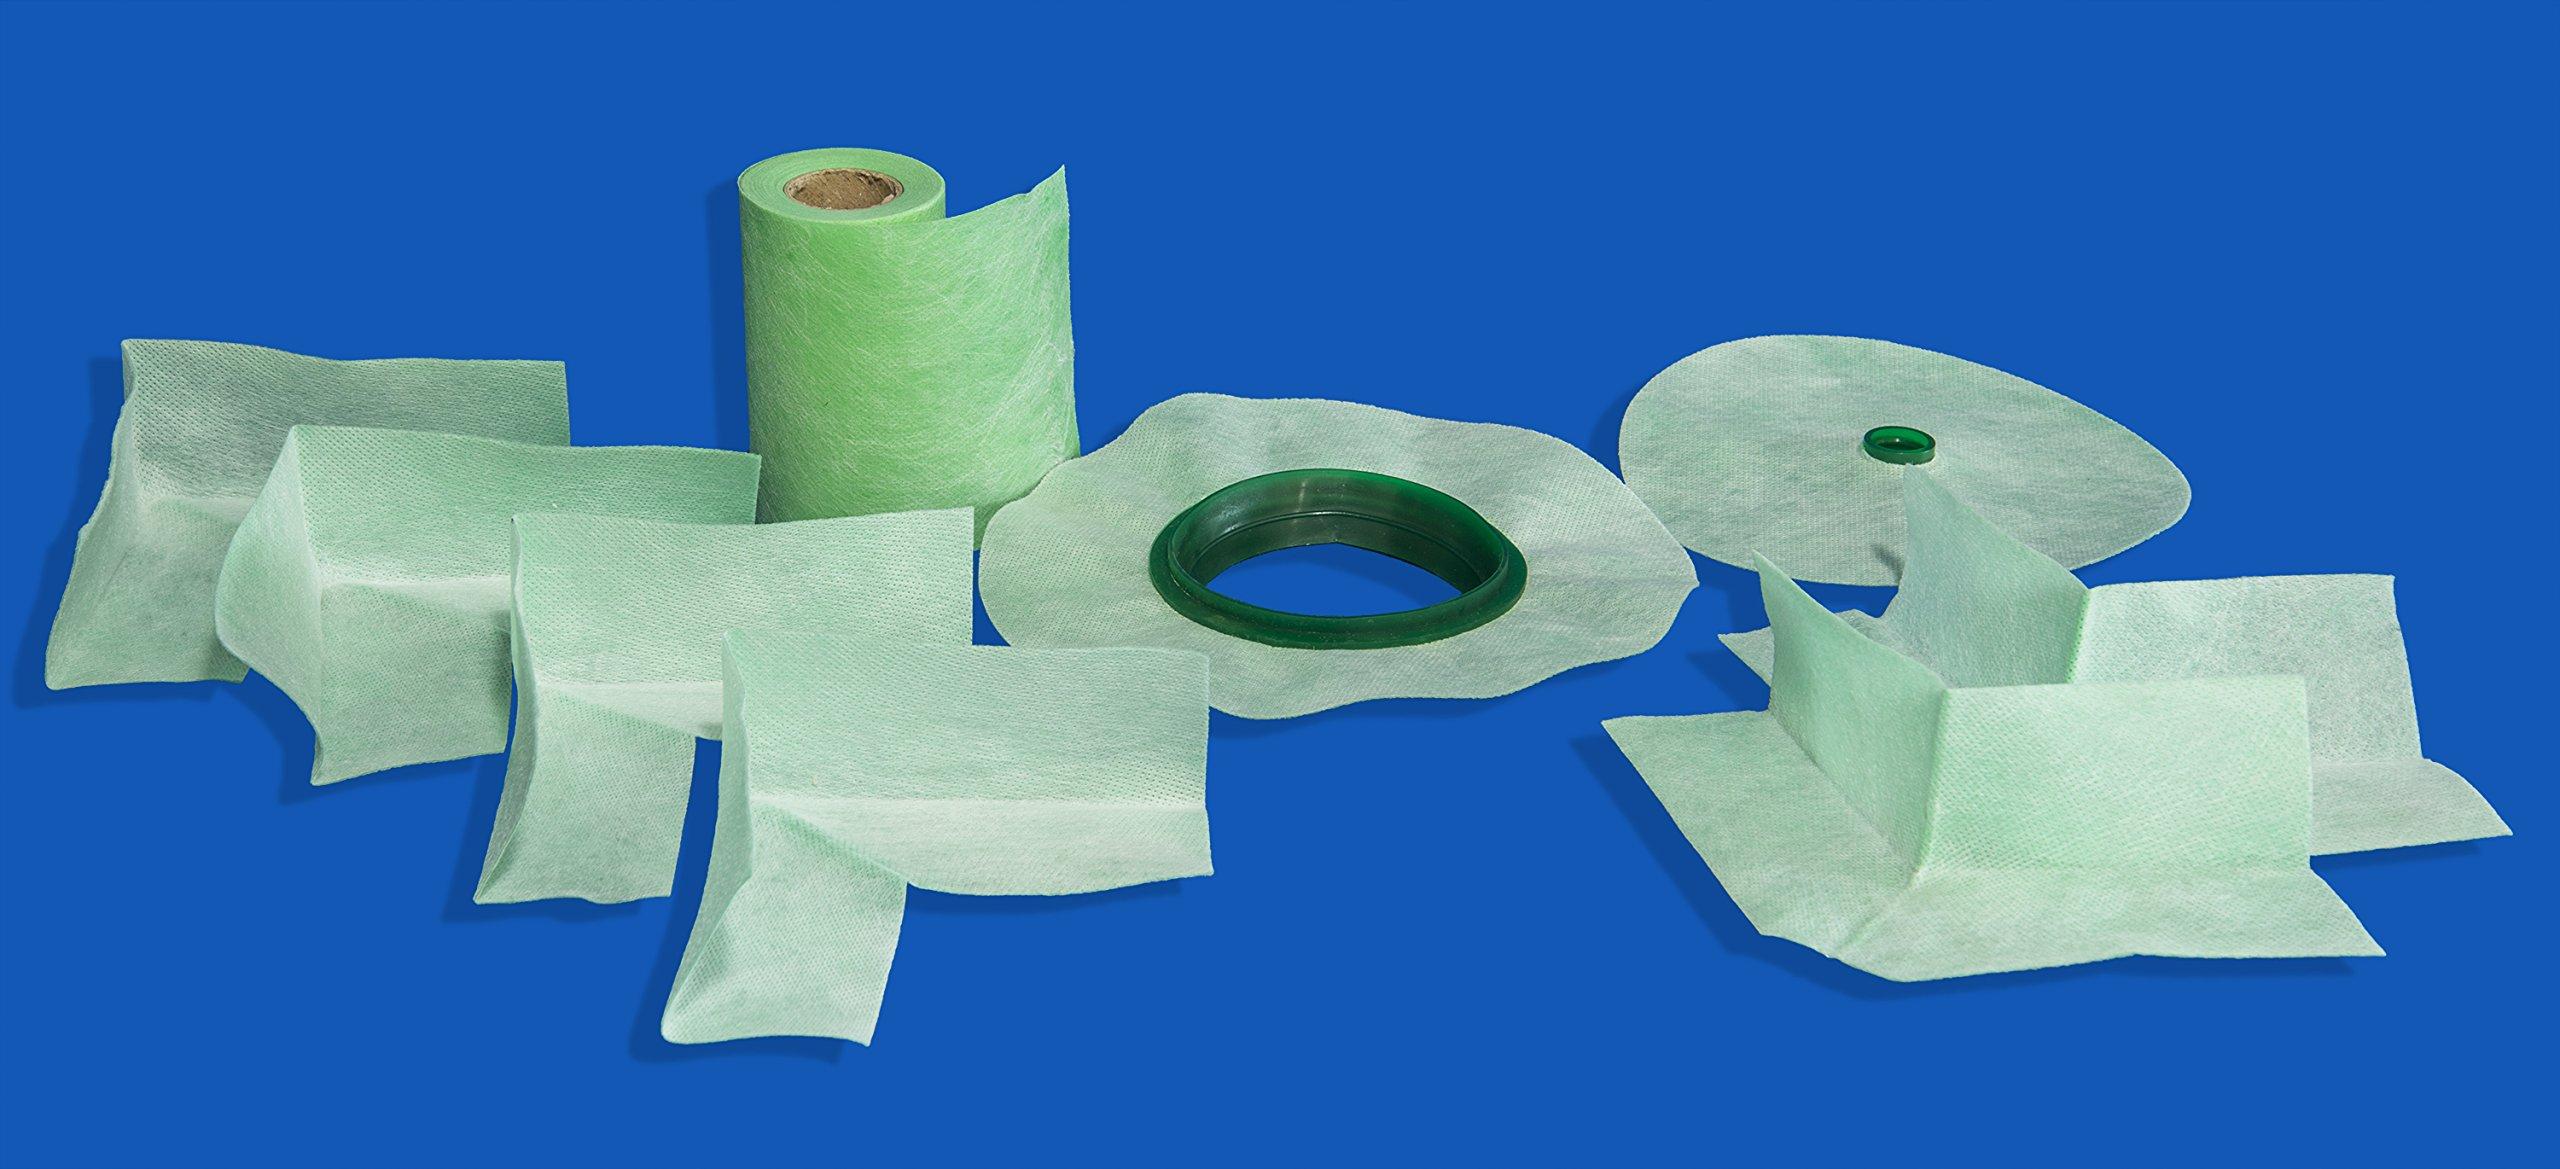 Tile Shower Waterproofing Fabric Membrane | Green Seal | By All Tile (Full Kit)